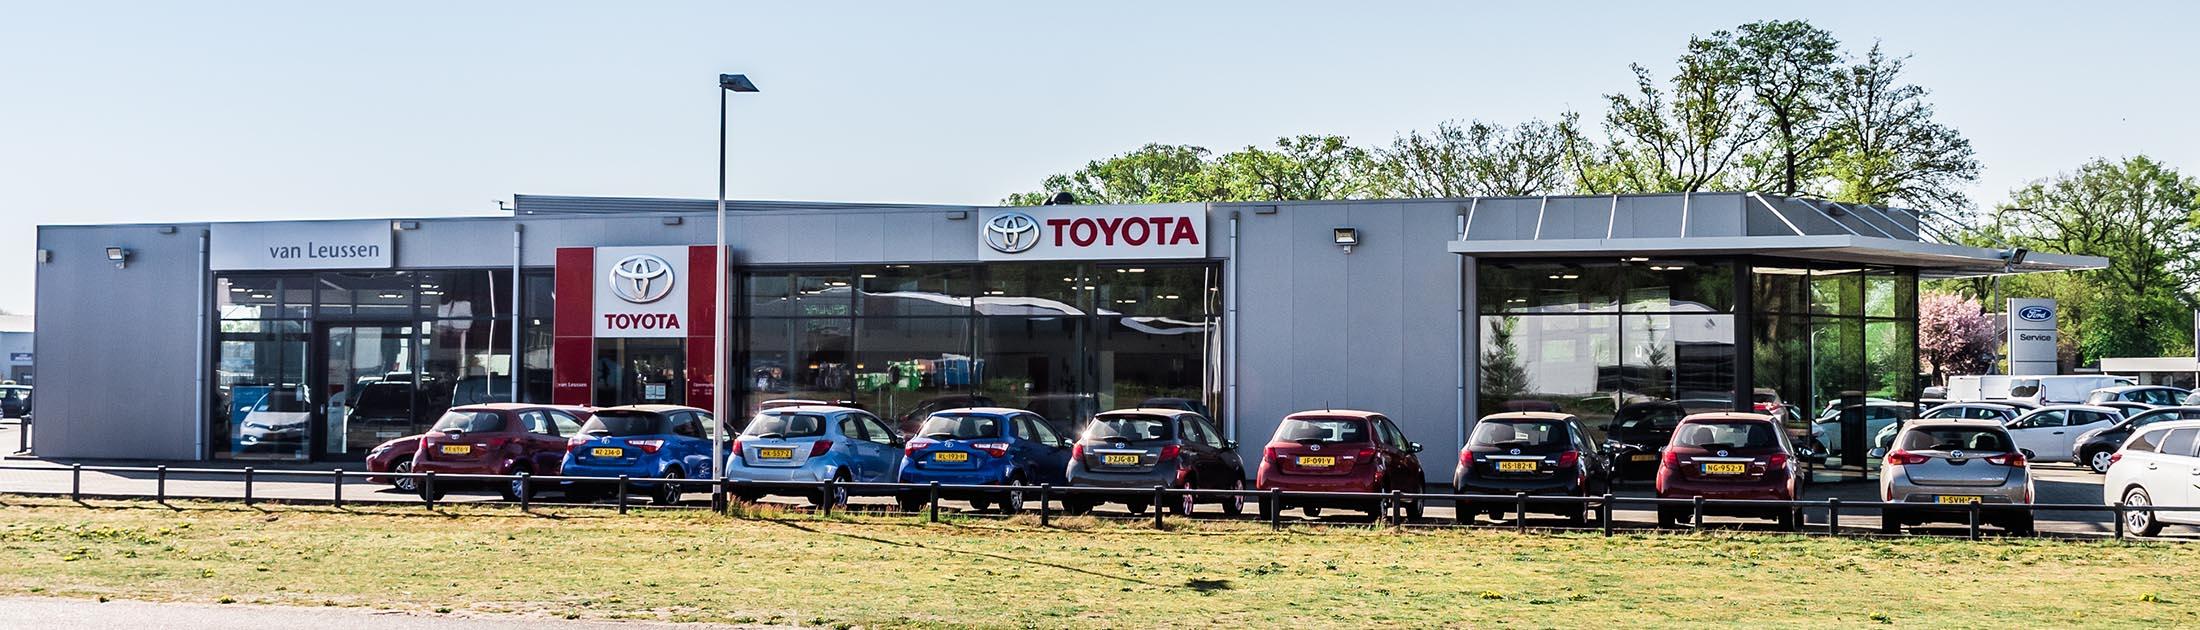 Garage van Leussen Ommen Toyota